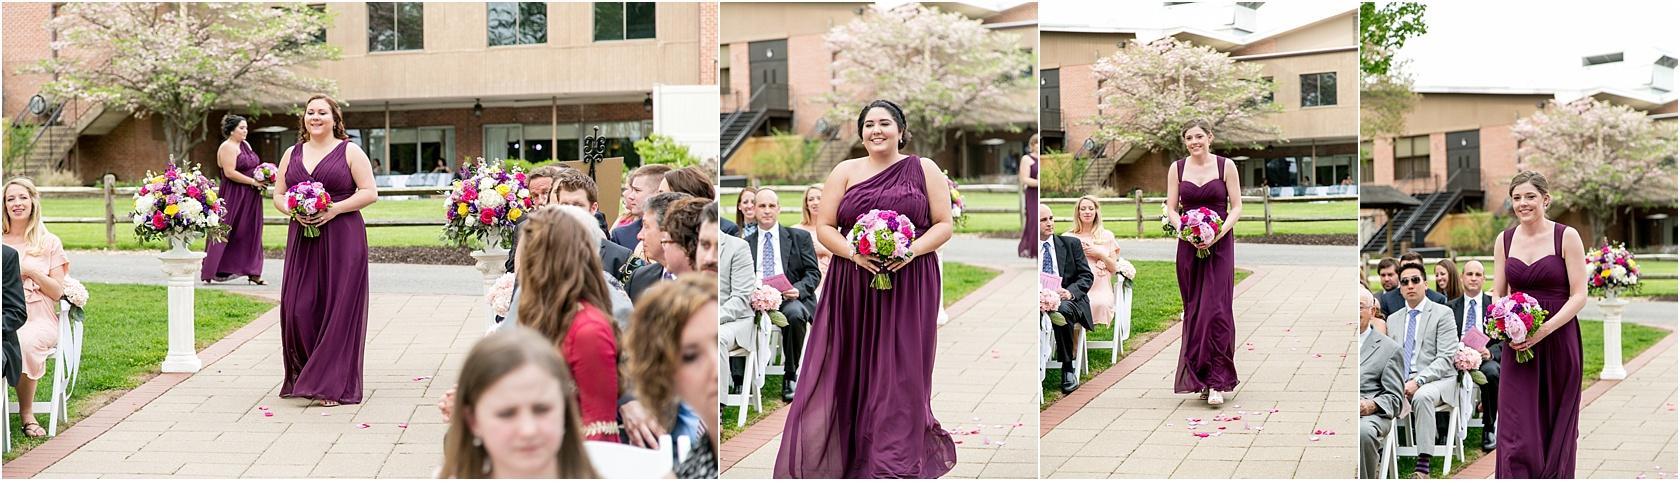 Sagal Wedding Turf Valley Resort Wedding Living Radiant Photography_0069.jpg